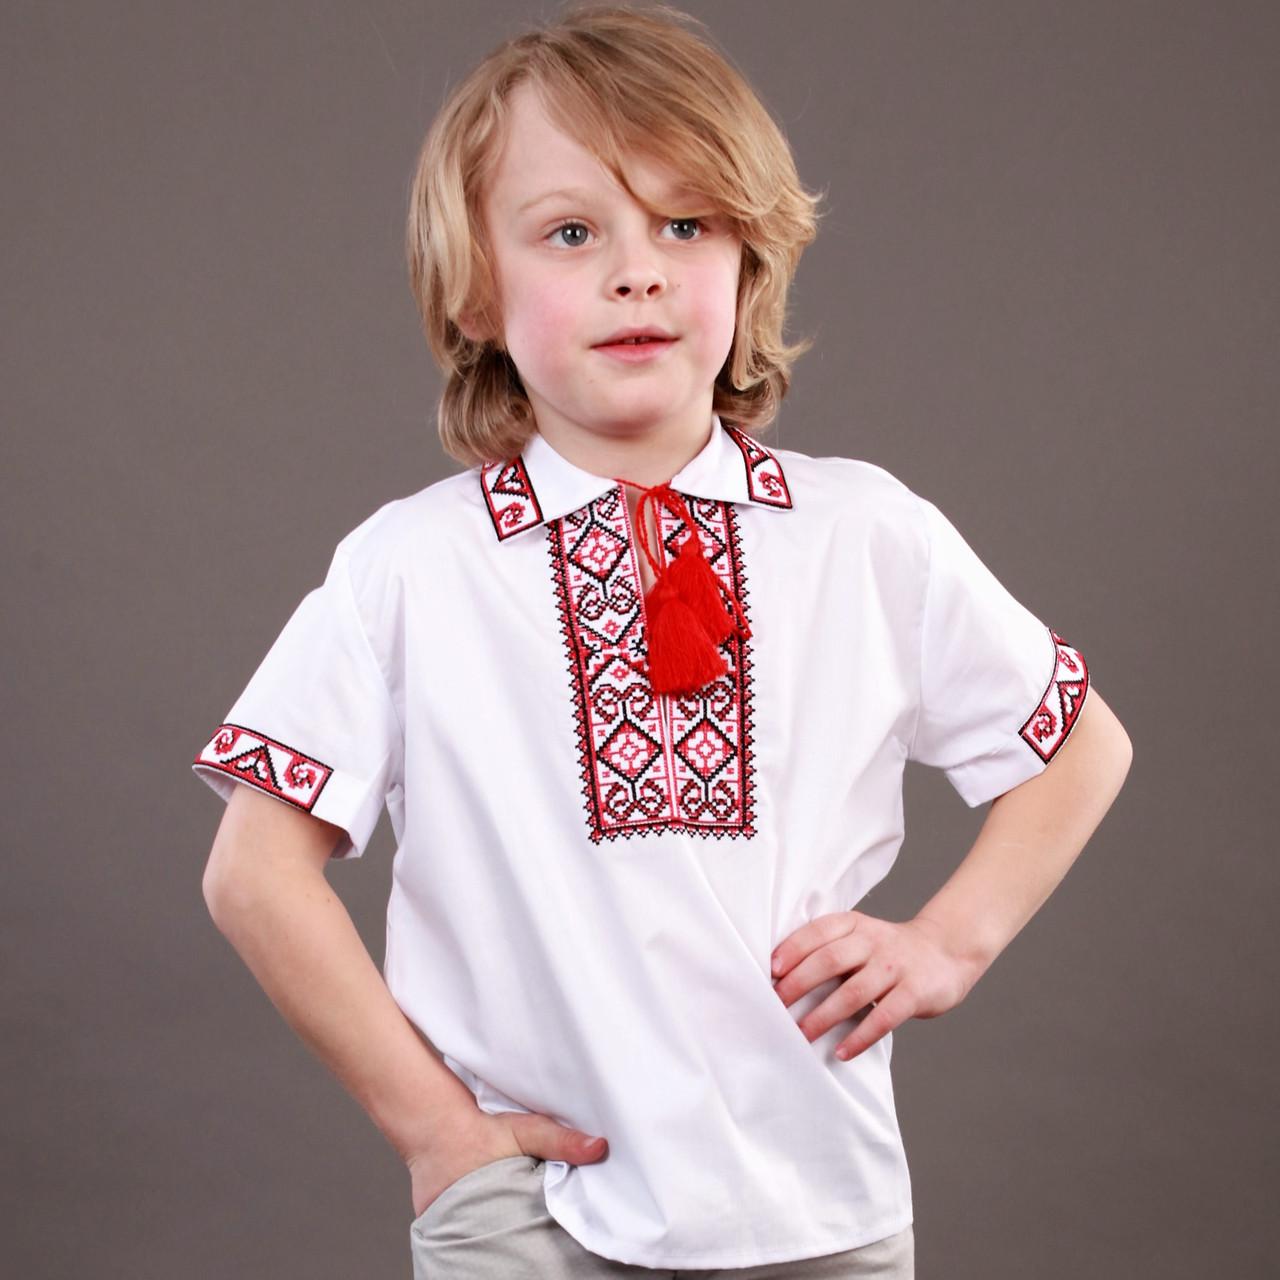 Вышитая рубашка для мальчика на батисте с коротким рукавом